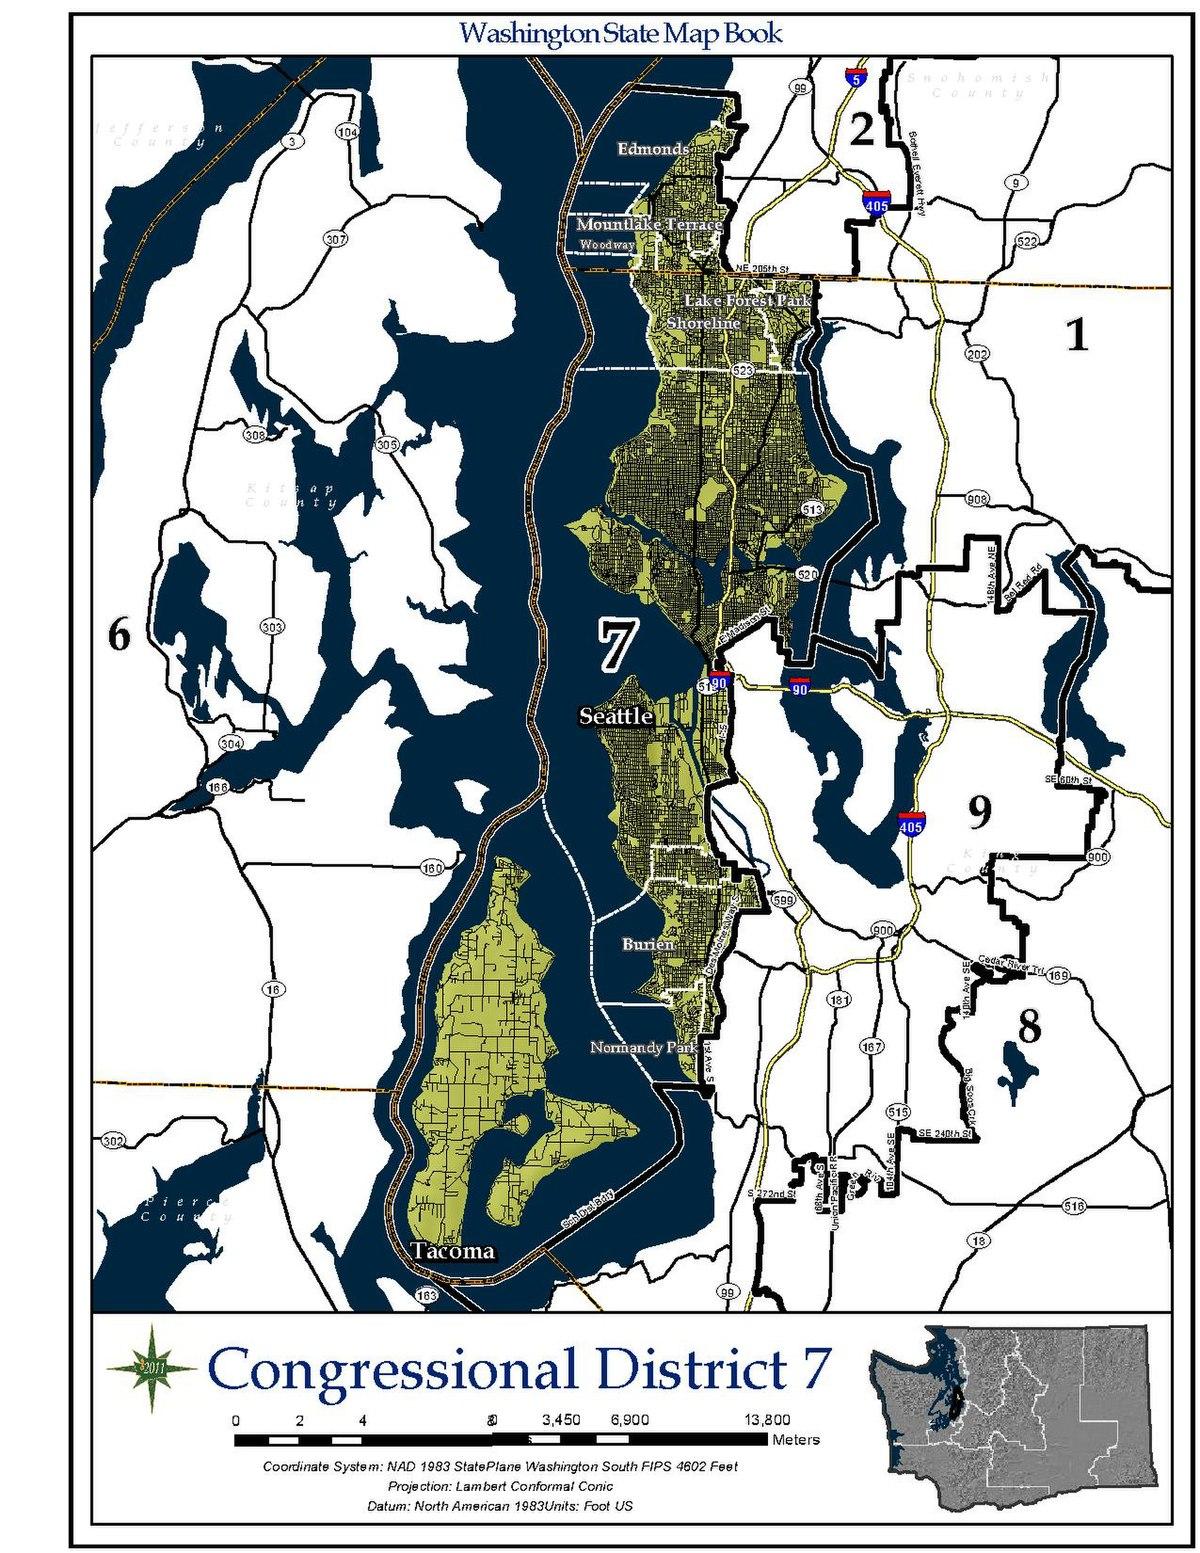 8th Congressional District Washington Map.Washington S 7th Congressional District Wikipedia